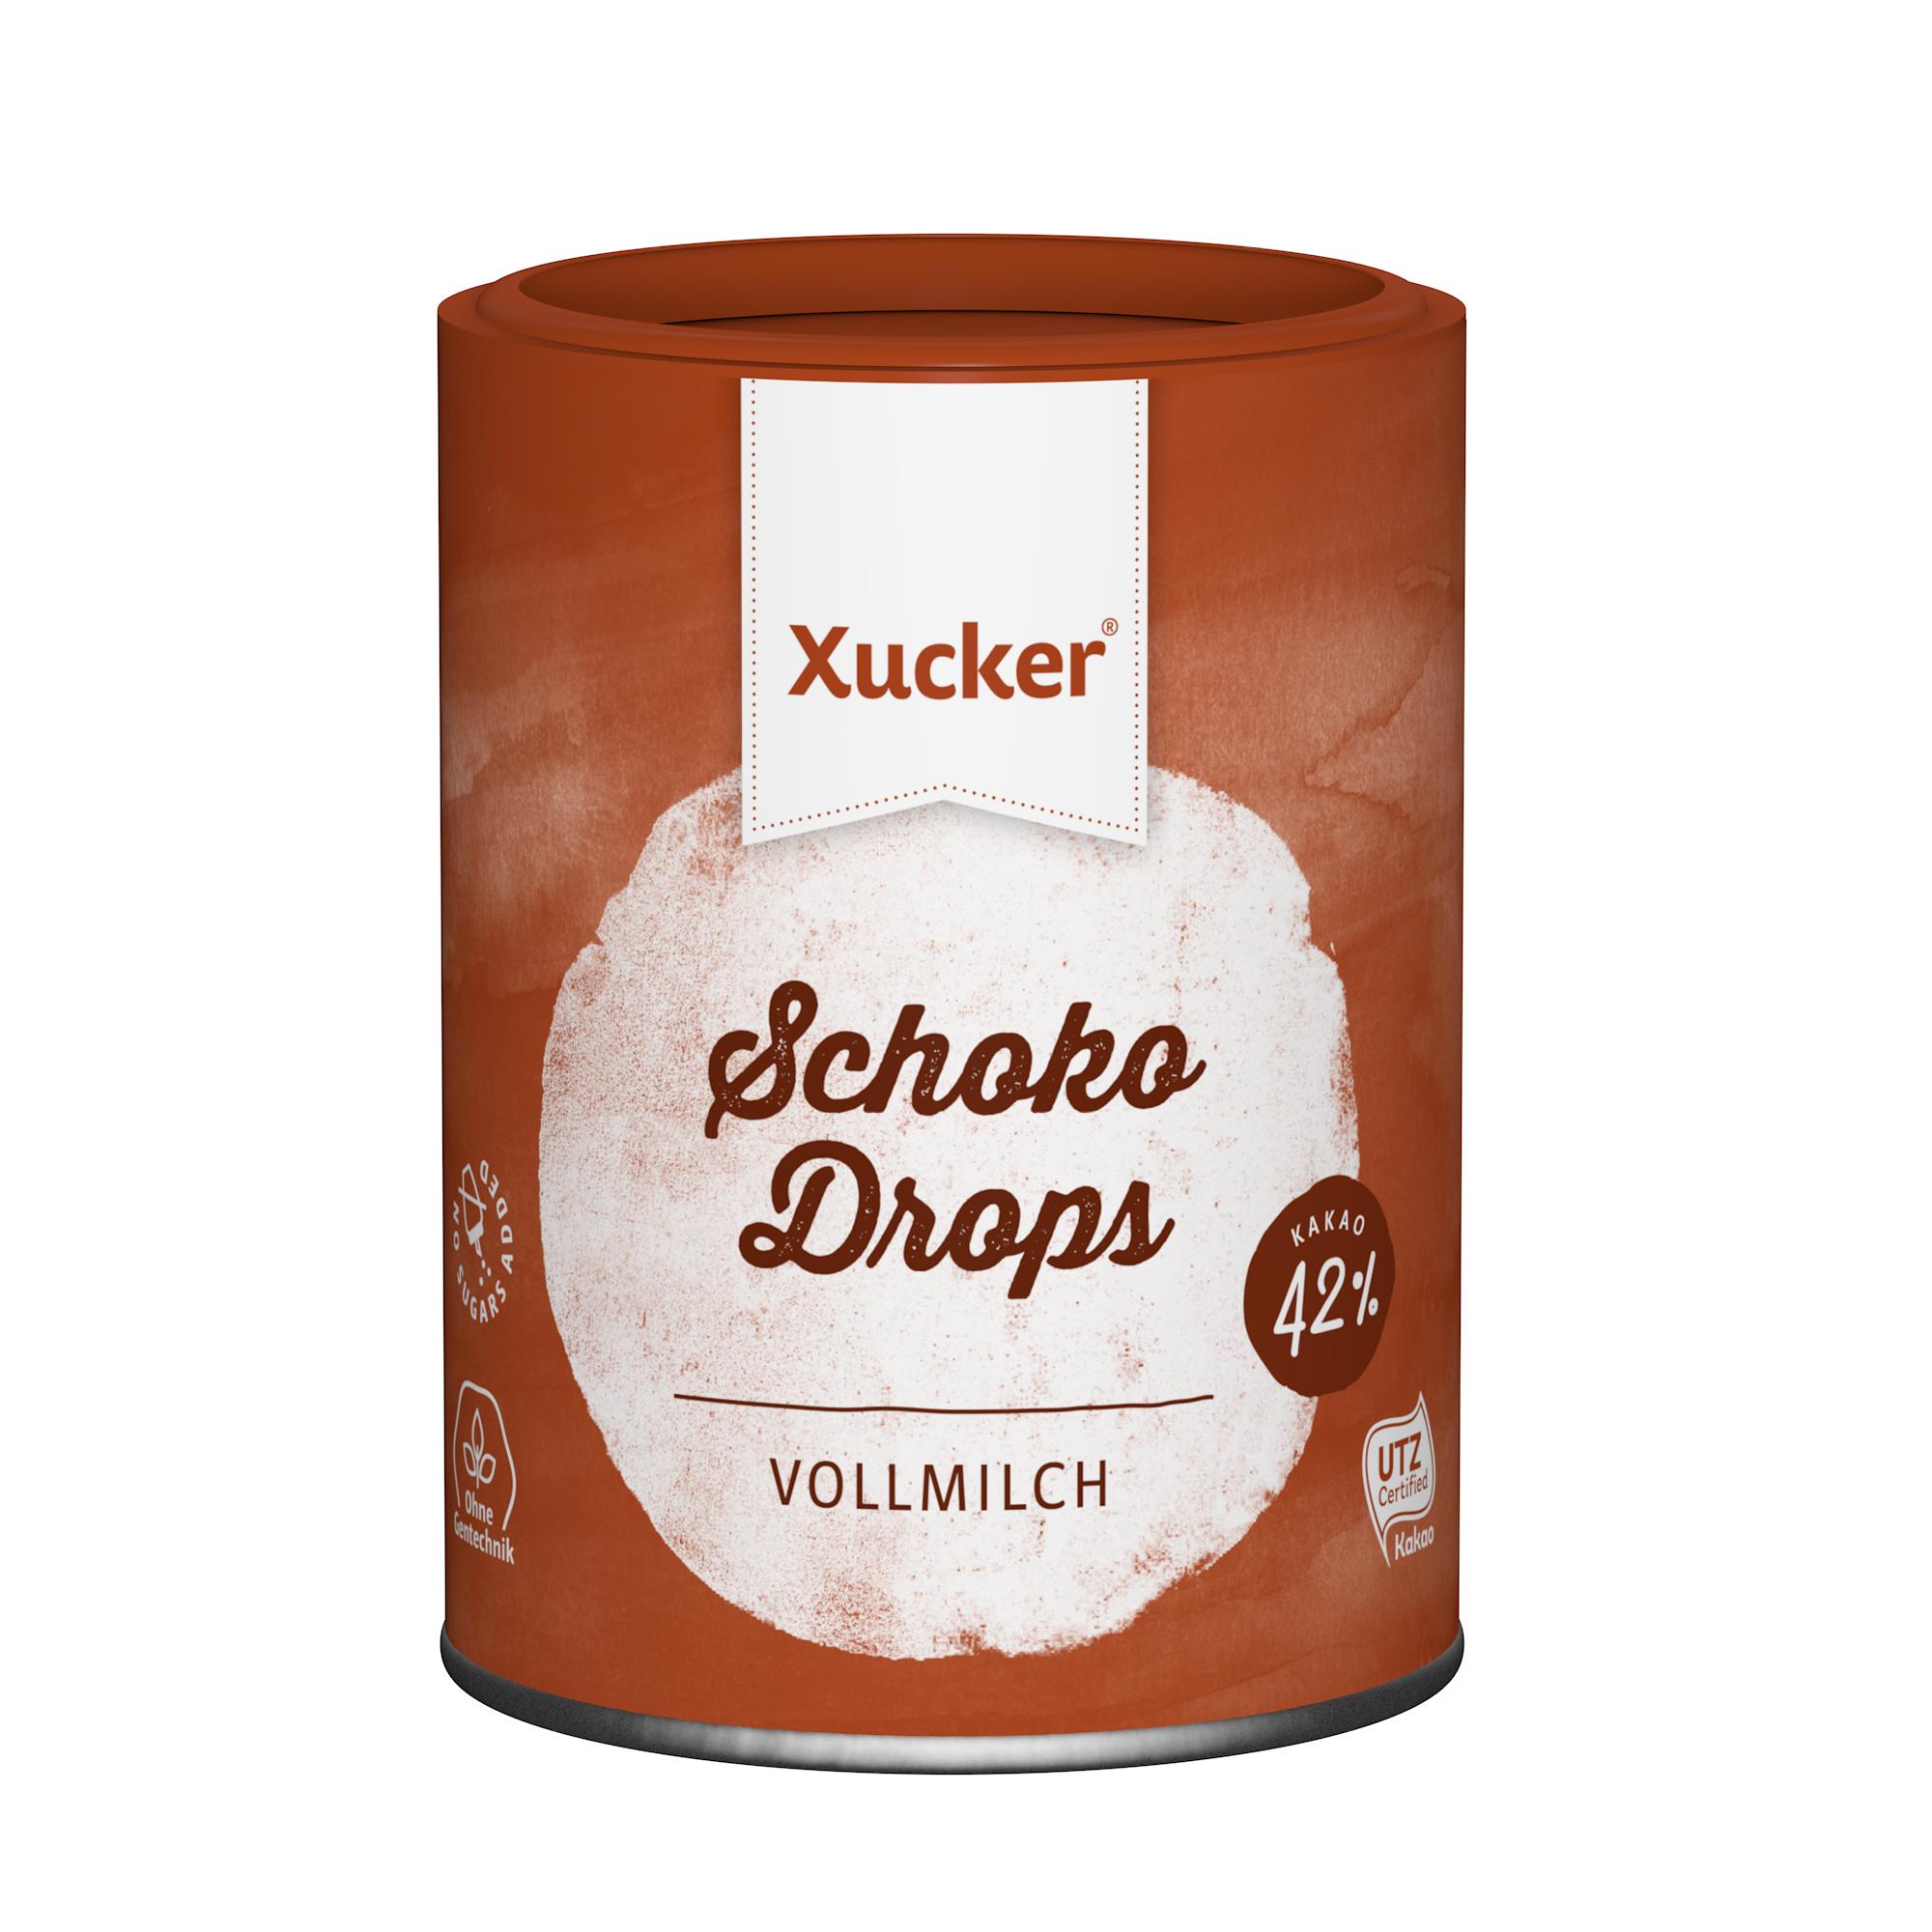 Xucker Schoko Drops Vollmilch 200g